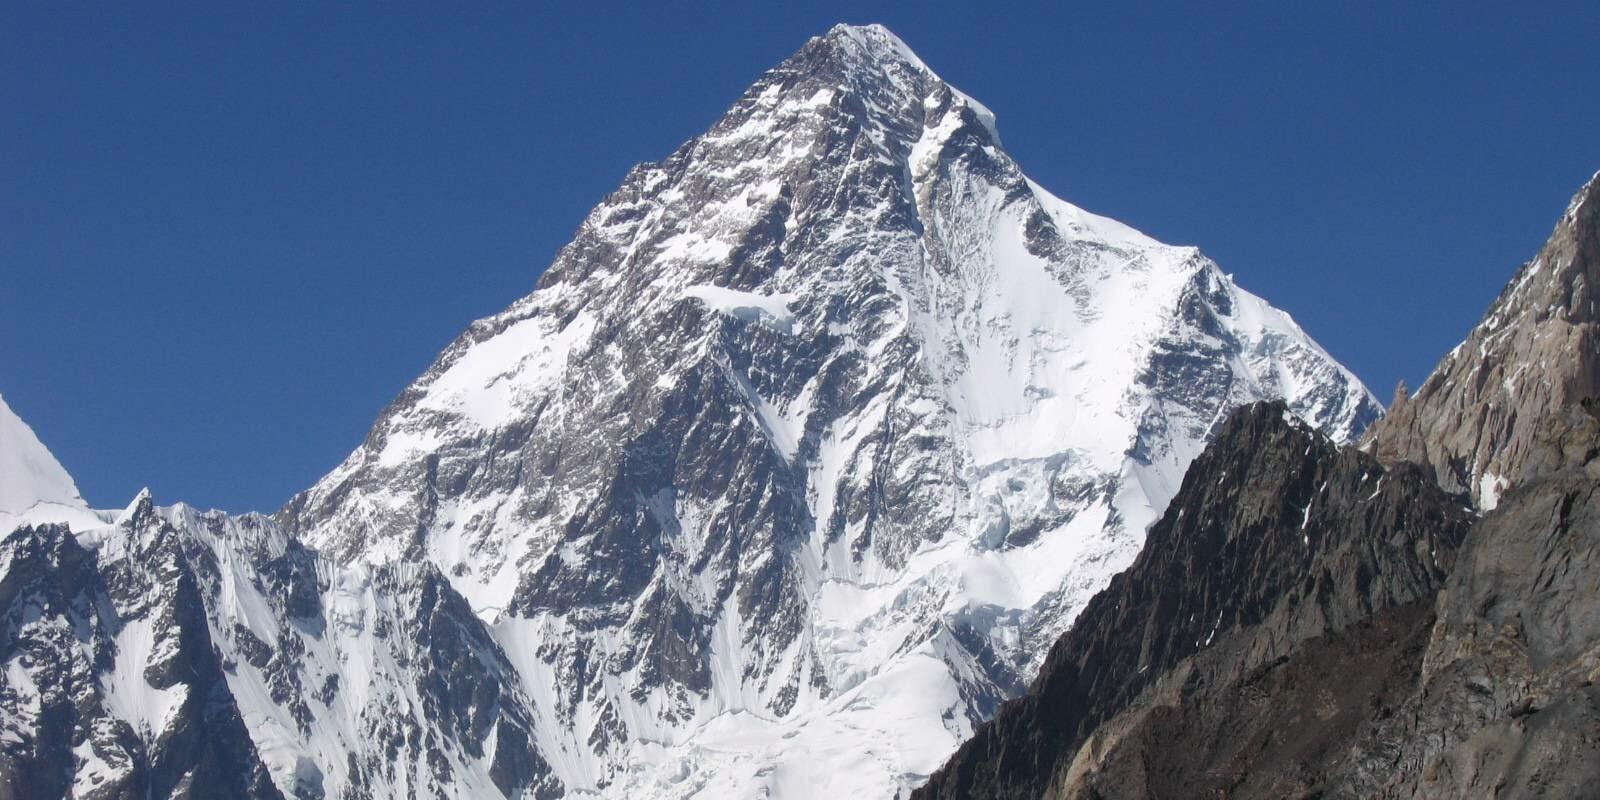 El K2, en arxiu | Viquipèdia